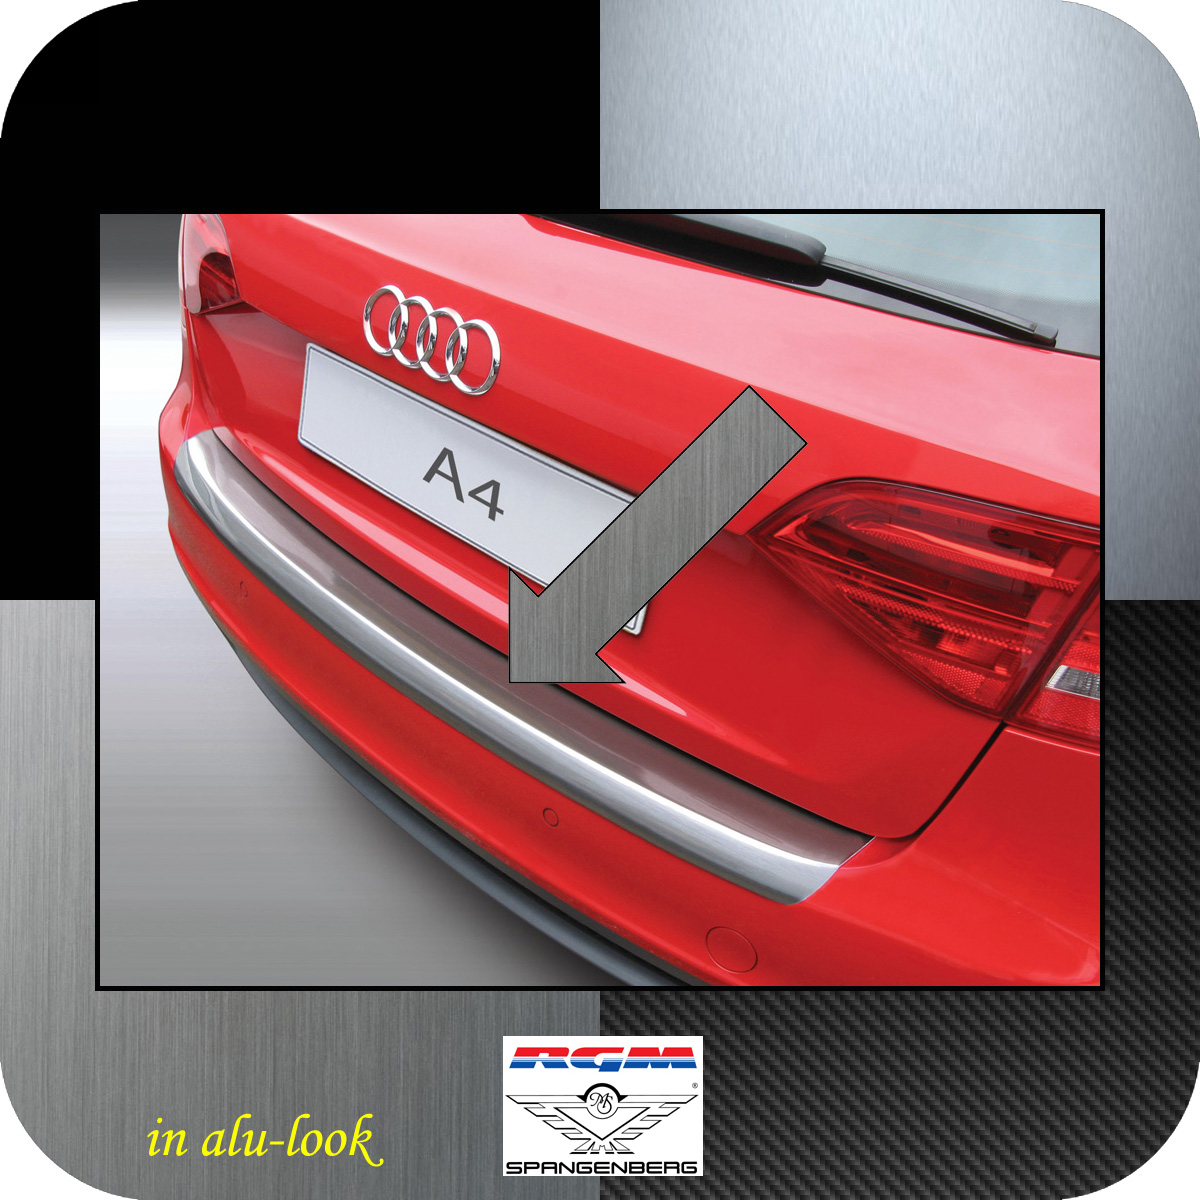 Ladekantenschutz Alu-Look Audi A4 B8 Avant Kombi vor facelift 2008-11 3504159